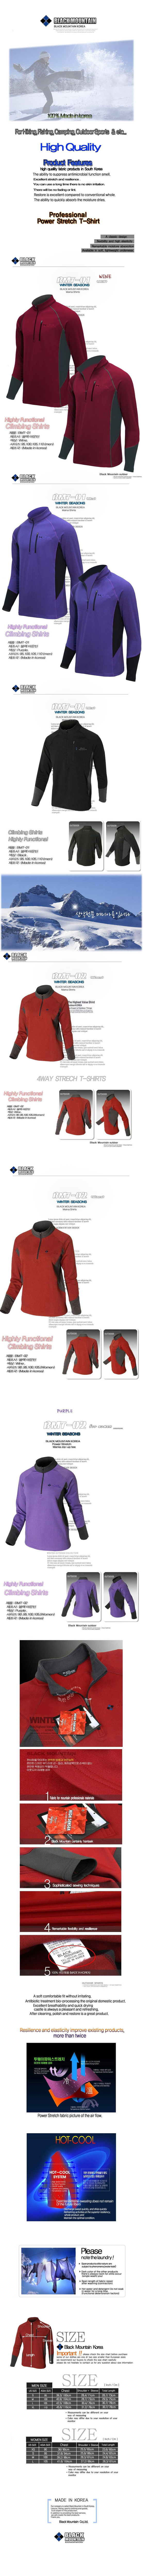 NEW Mens Womens Mountain Hiking Camping Outdoor Winter Mania Jip-up Shirt